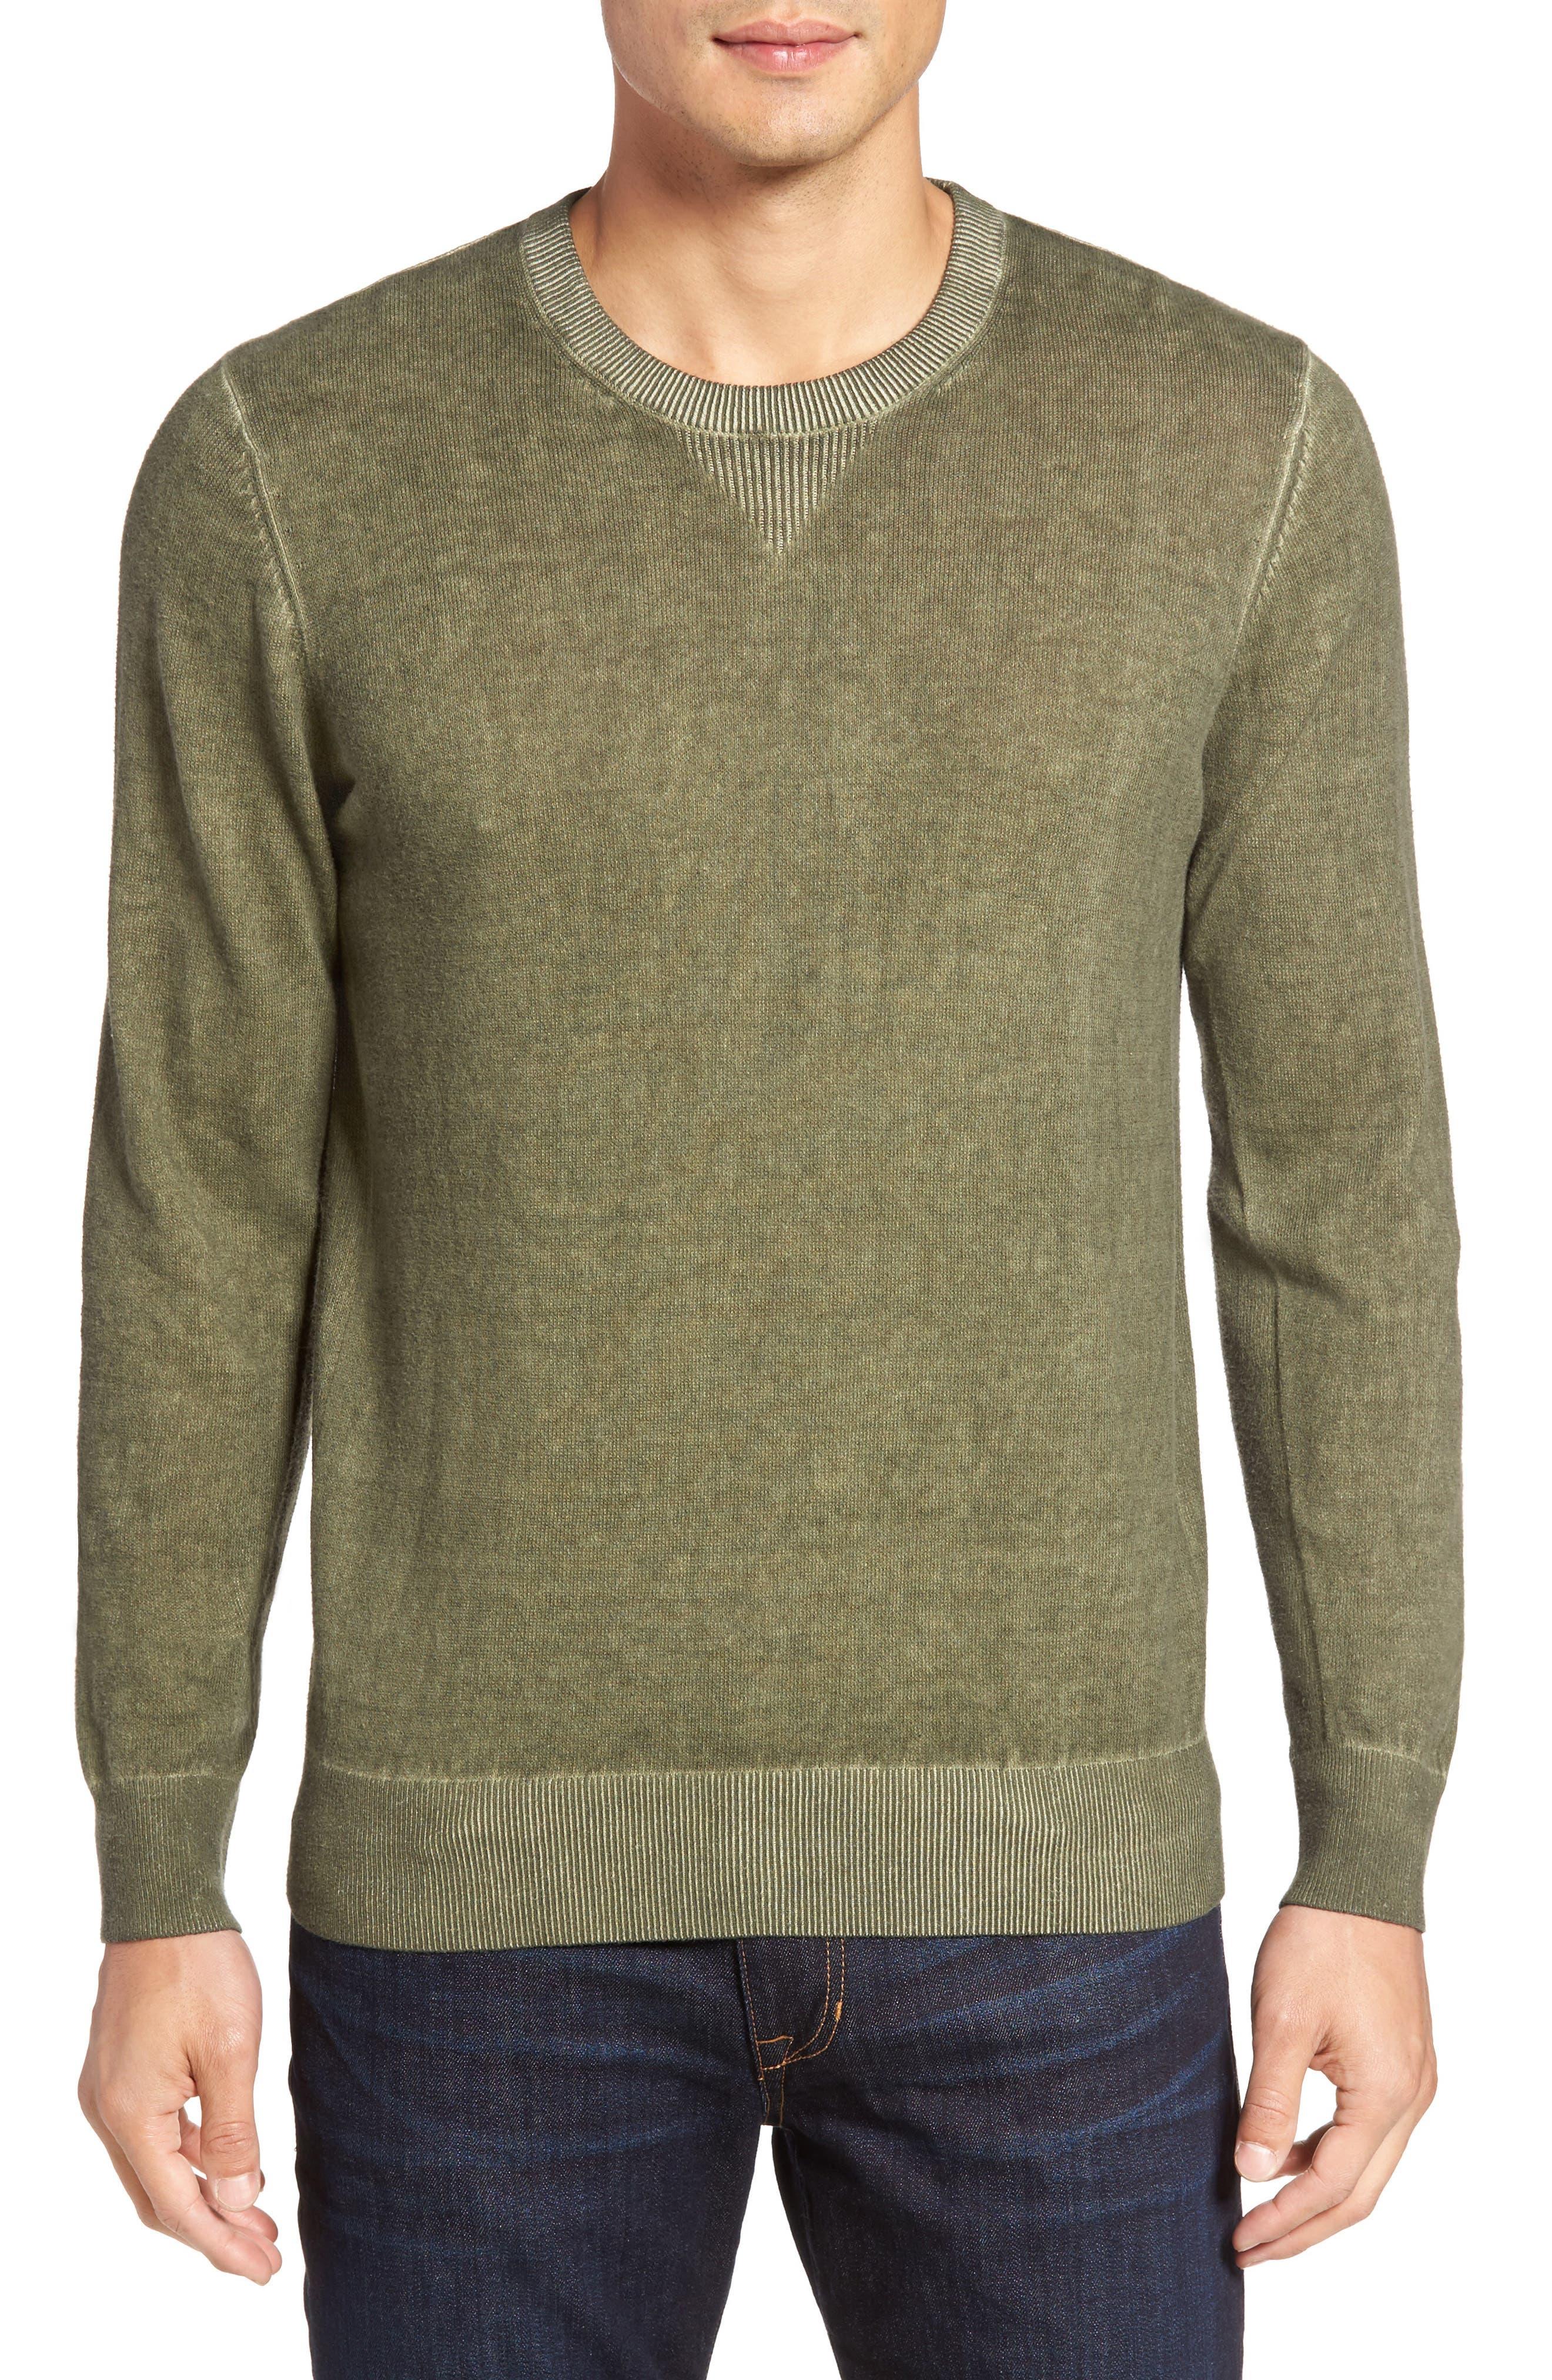 Mace Crewneck Sweater,                         Main,                         color, 316